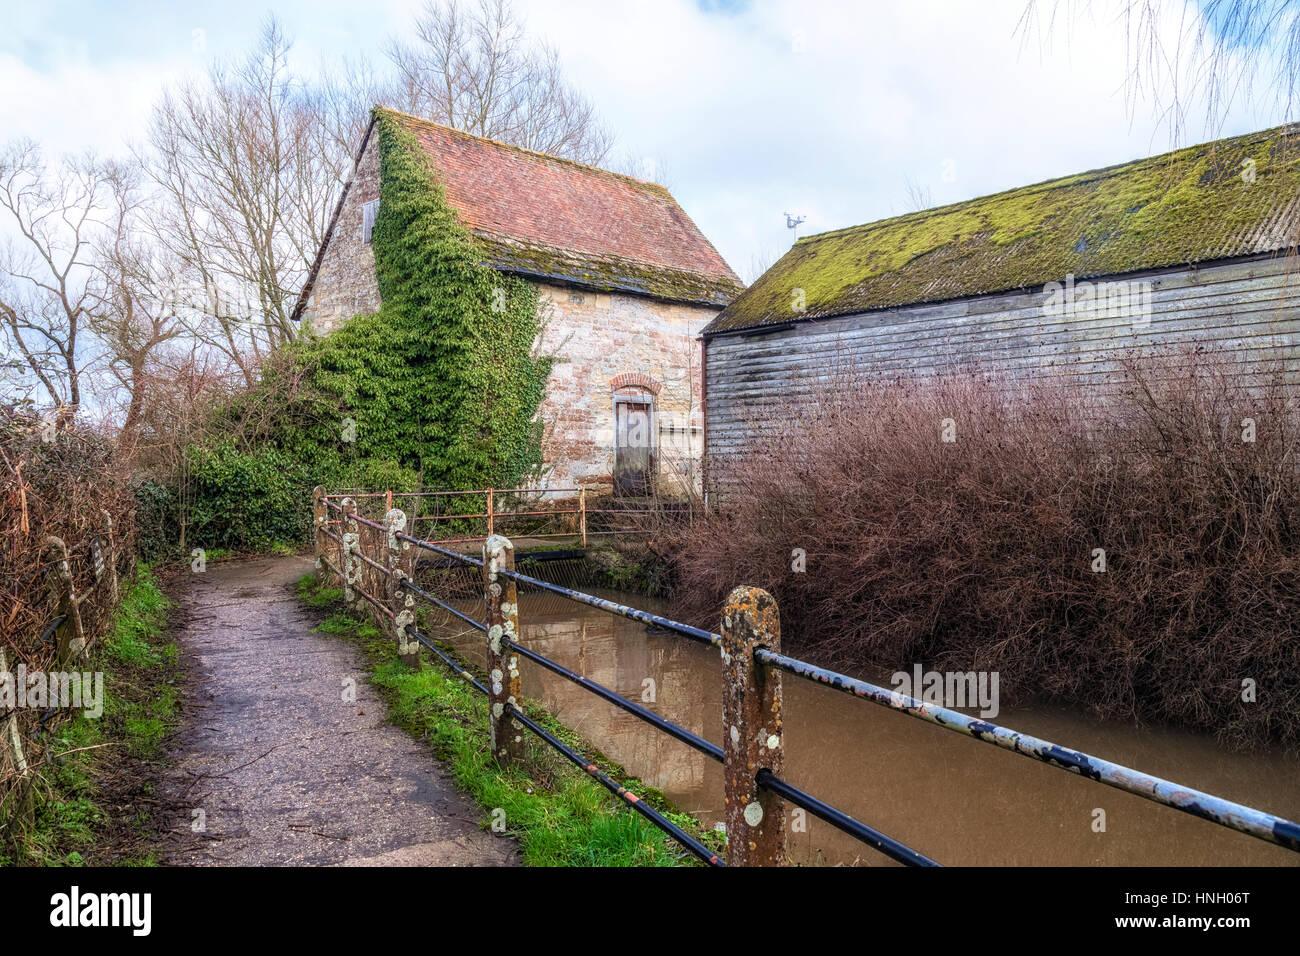 Fiddleford Mill, Sturminster Newton, Dorset, England, UK - Stock Image